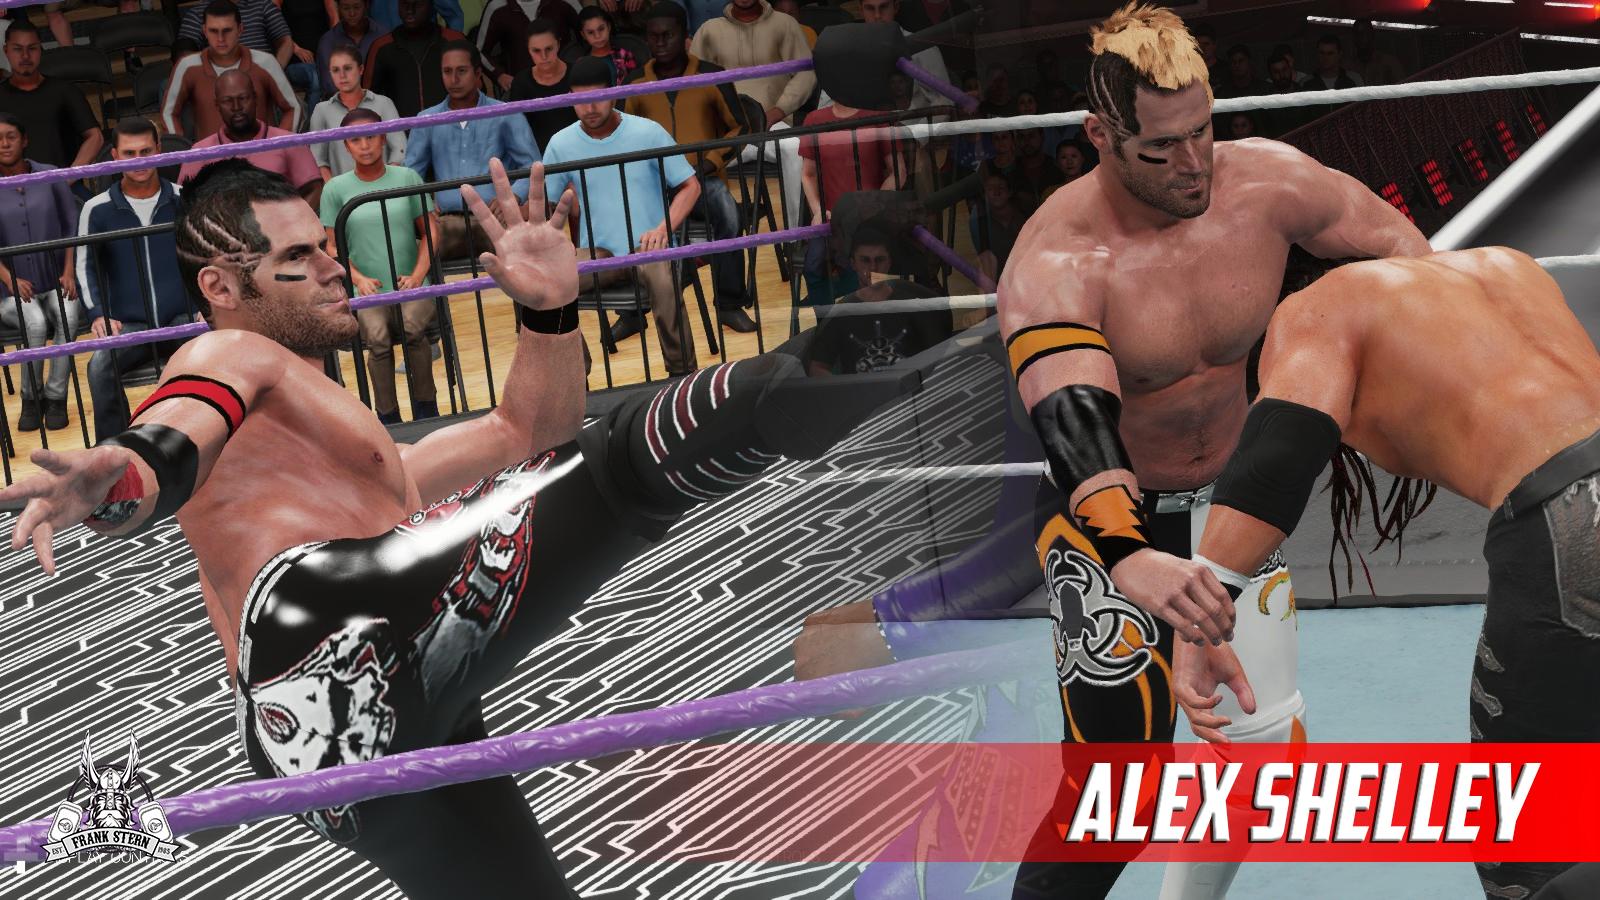 Preview-ALEX-SHELLEY.jpg